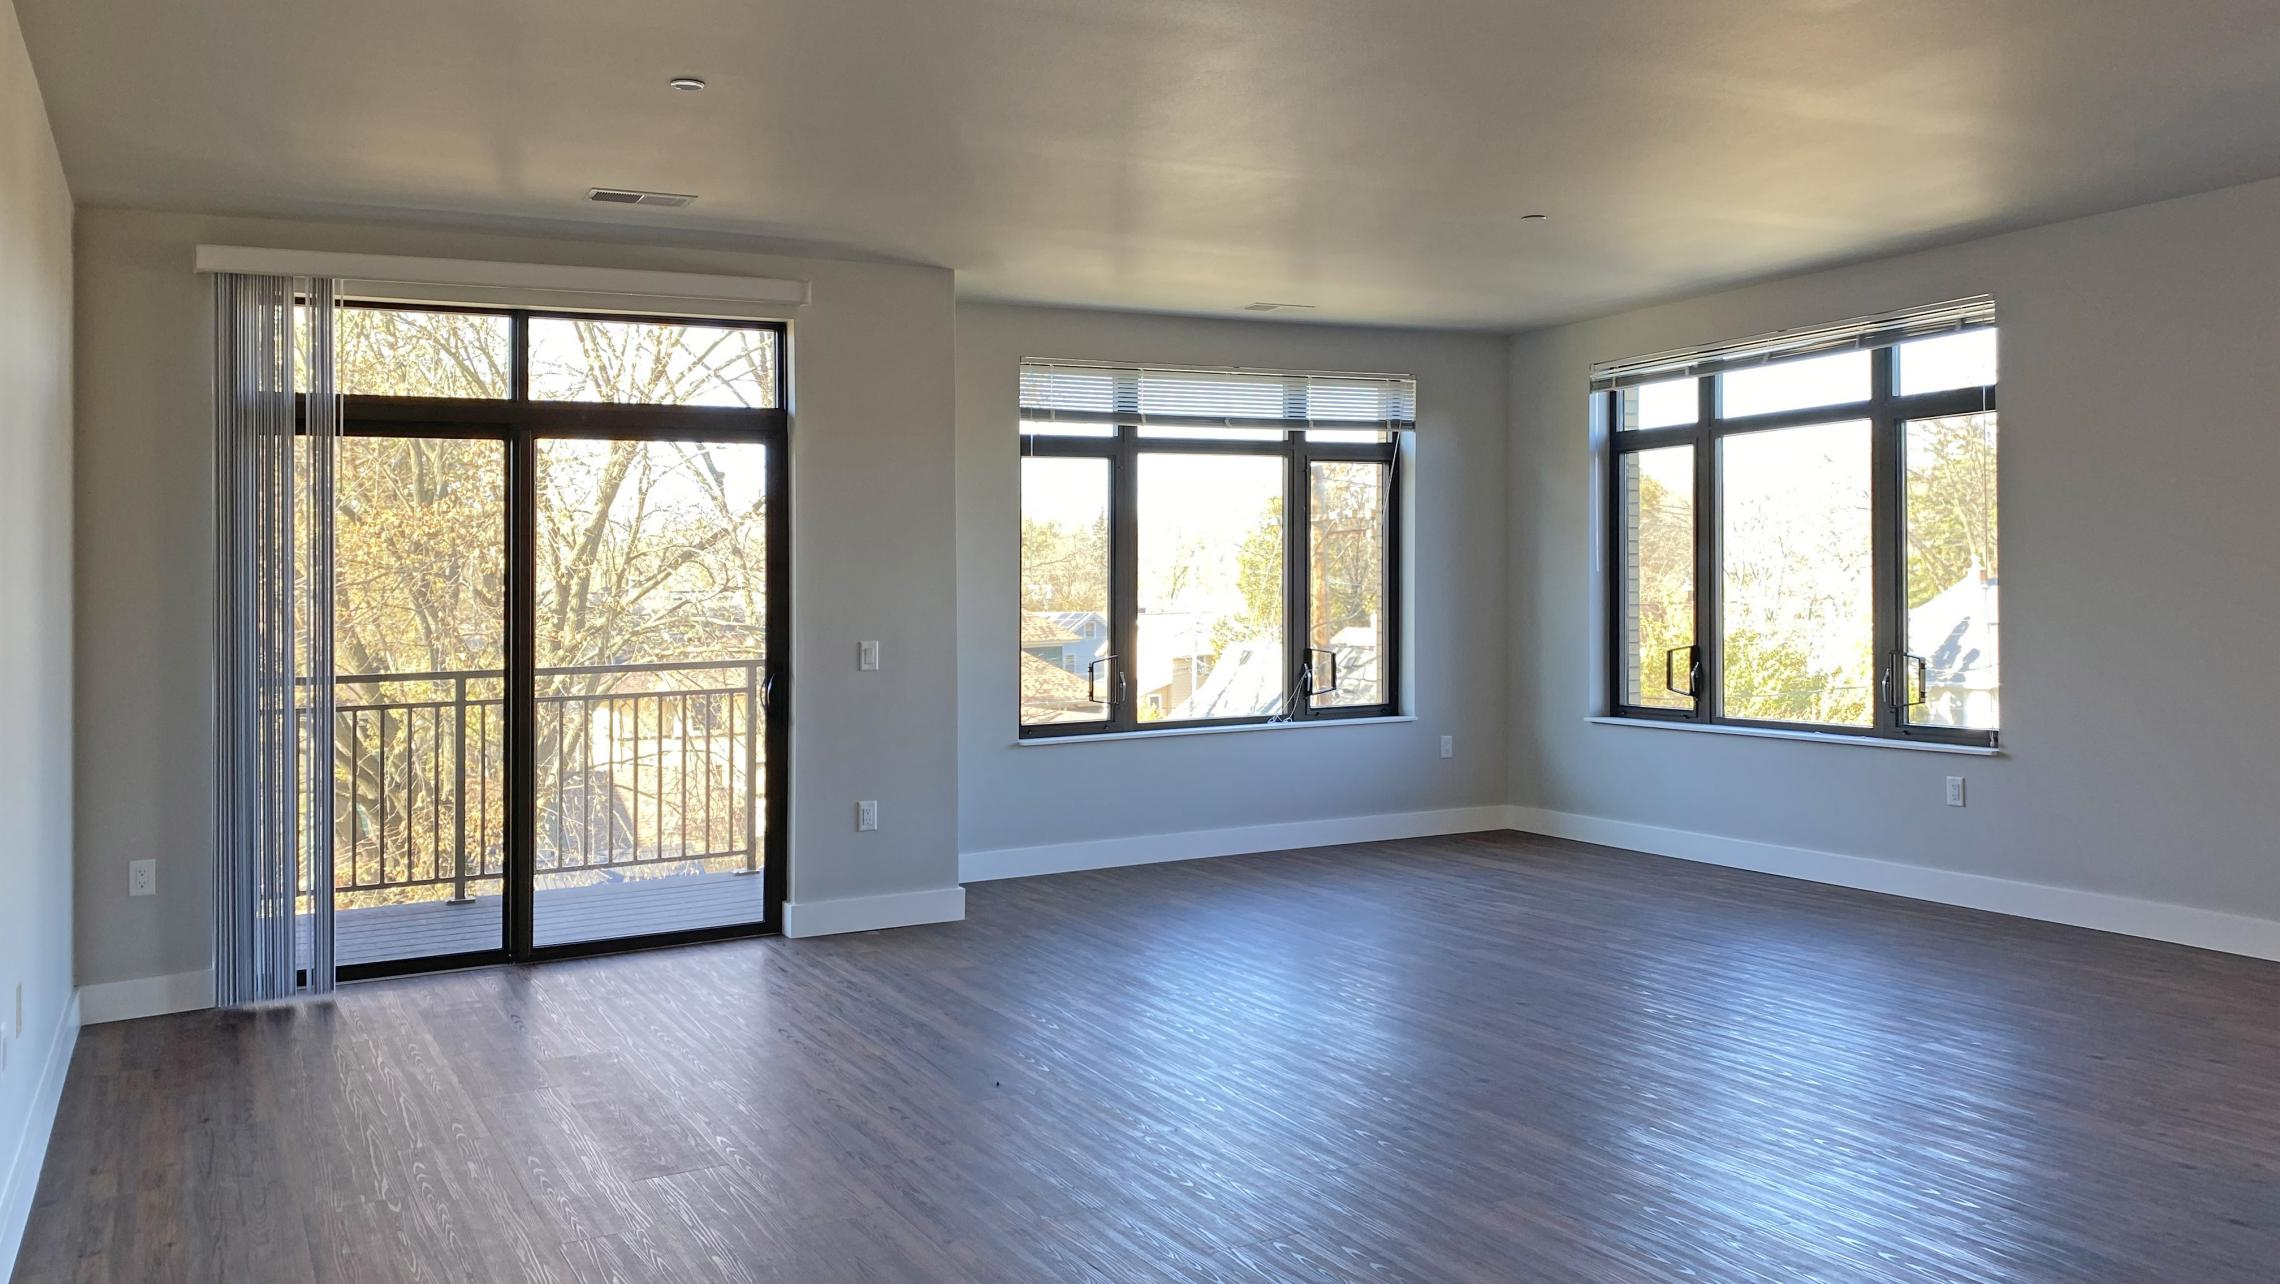 1722-Monroe-Apartments-320-Three-Bedroom-Modern-Upscale-Design-Windows-Natural-Light-Balcony-Gym-Terrace-Living-Luxury-Lounge-Madison-Views